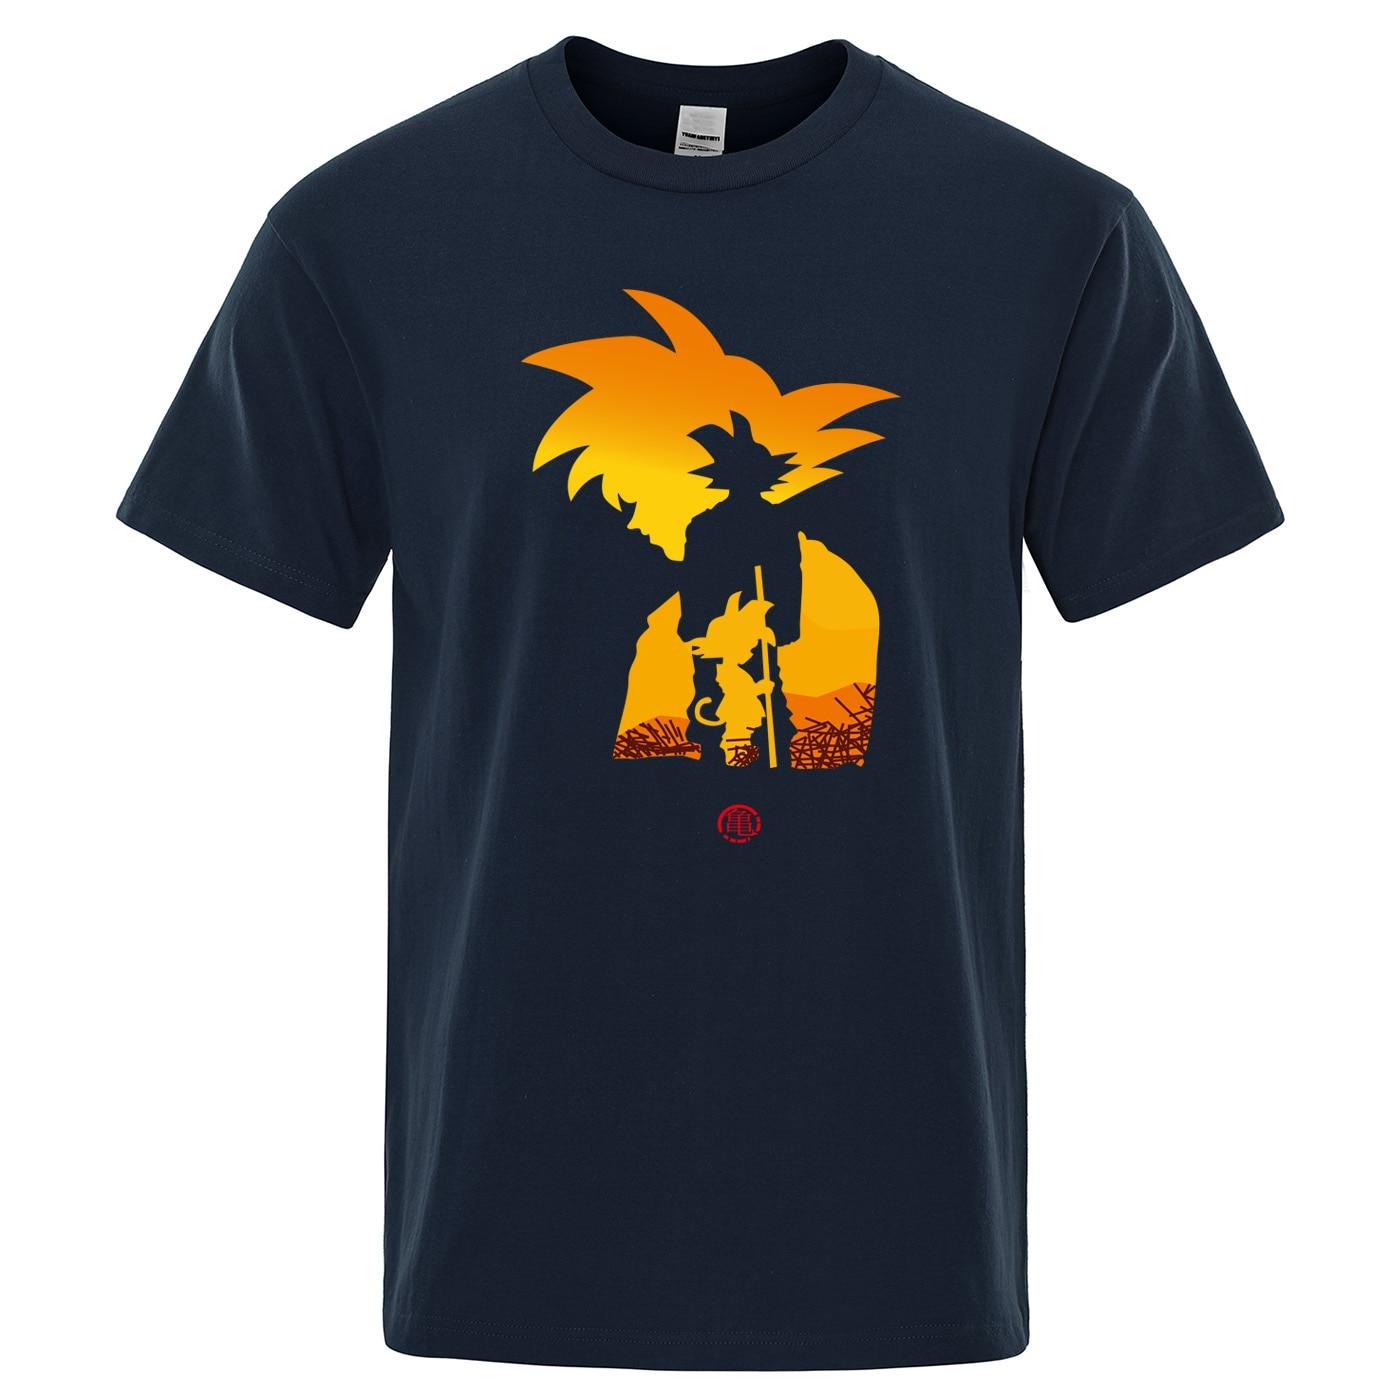 Dragon Ball Z Goku Men's T-shirt Short Sleeve O-Neck Tshirt Summer Cotton Tops Tee Saiyan Harajuku Brand Clothing Men T Shirt